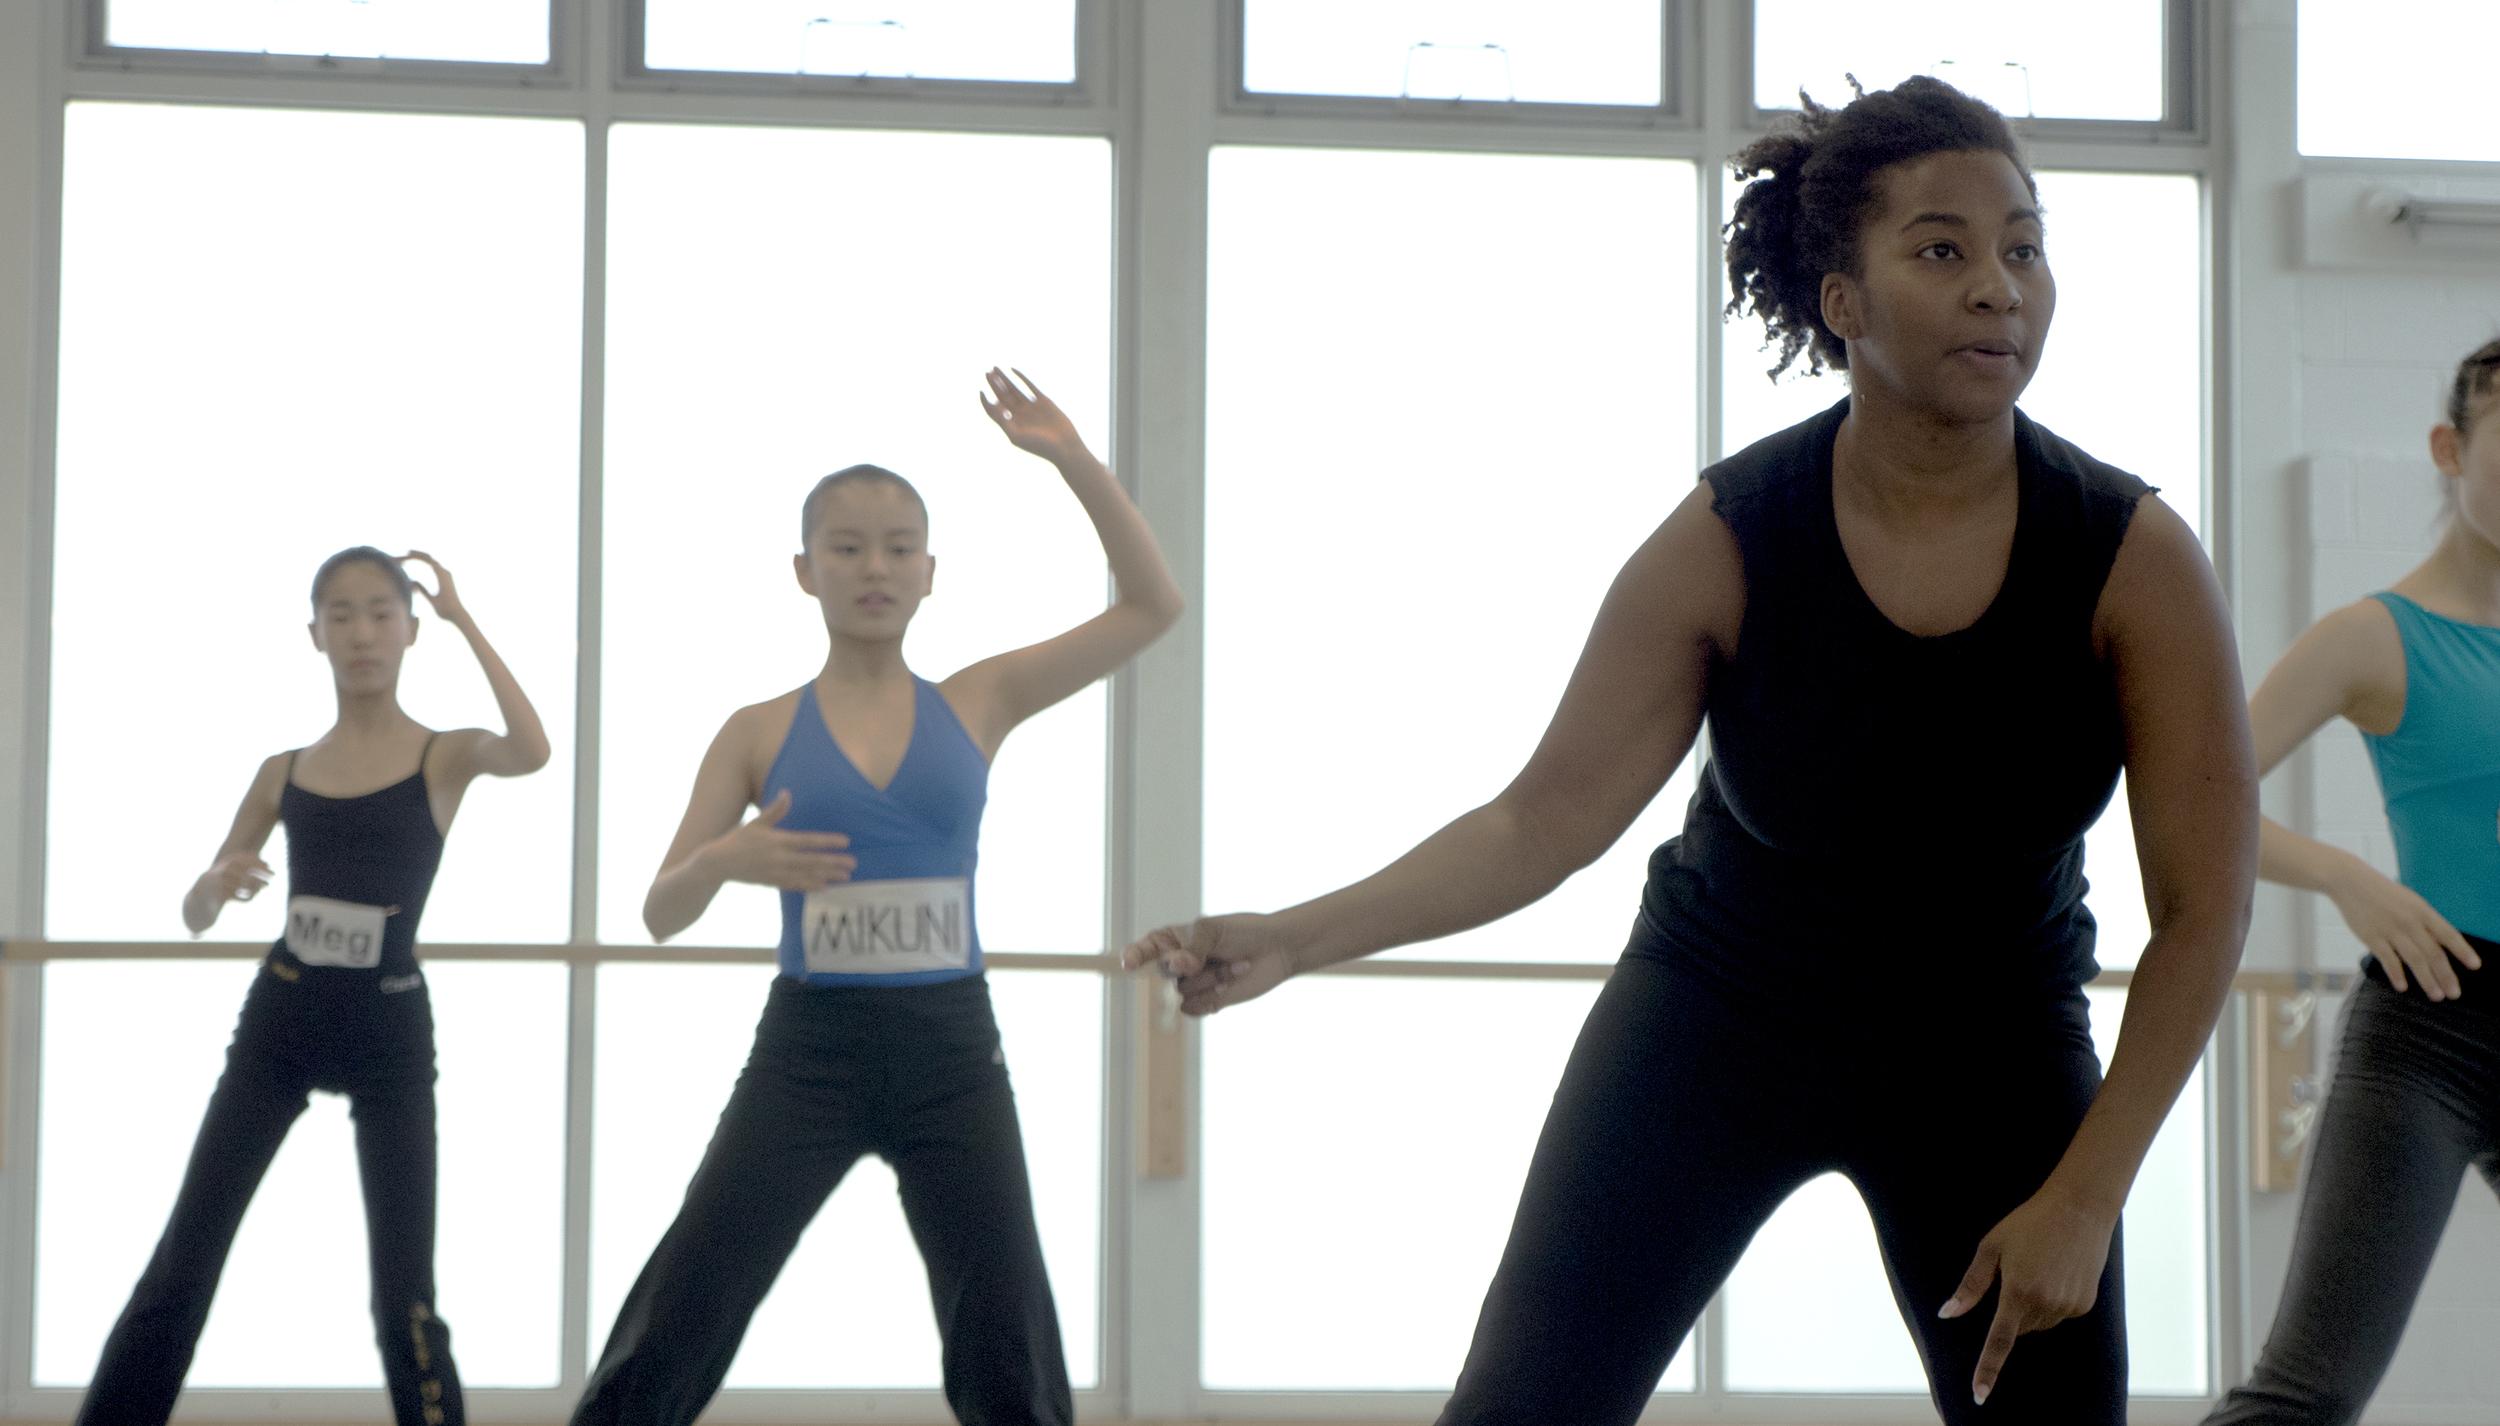 Melanie instructs visting students at The Washington School of Ballet. Photo by Gracie Corapi.